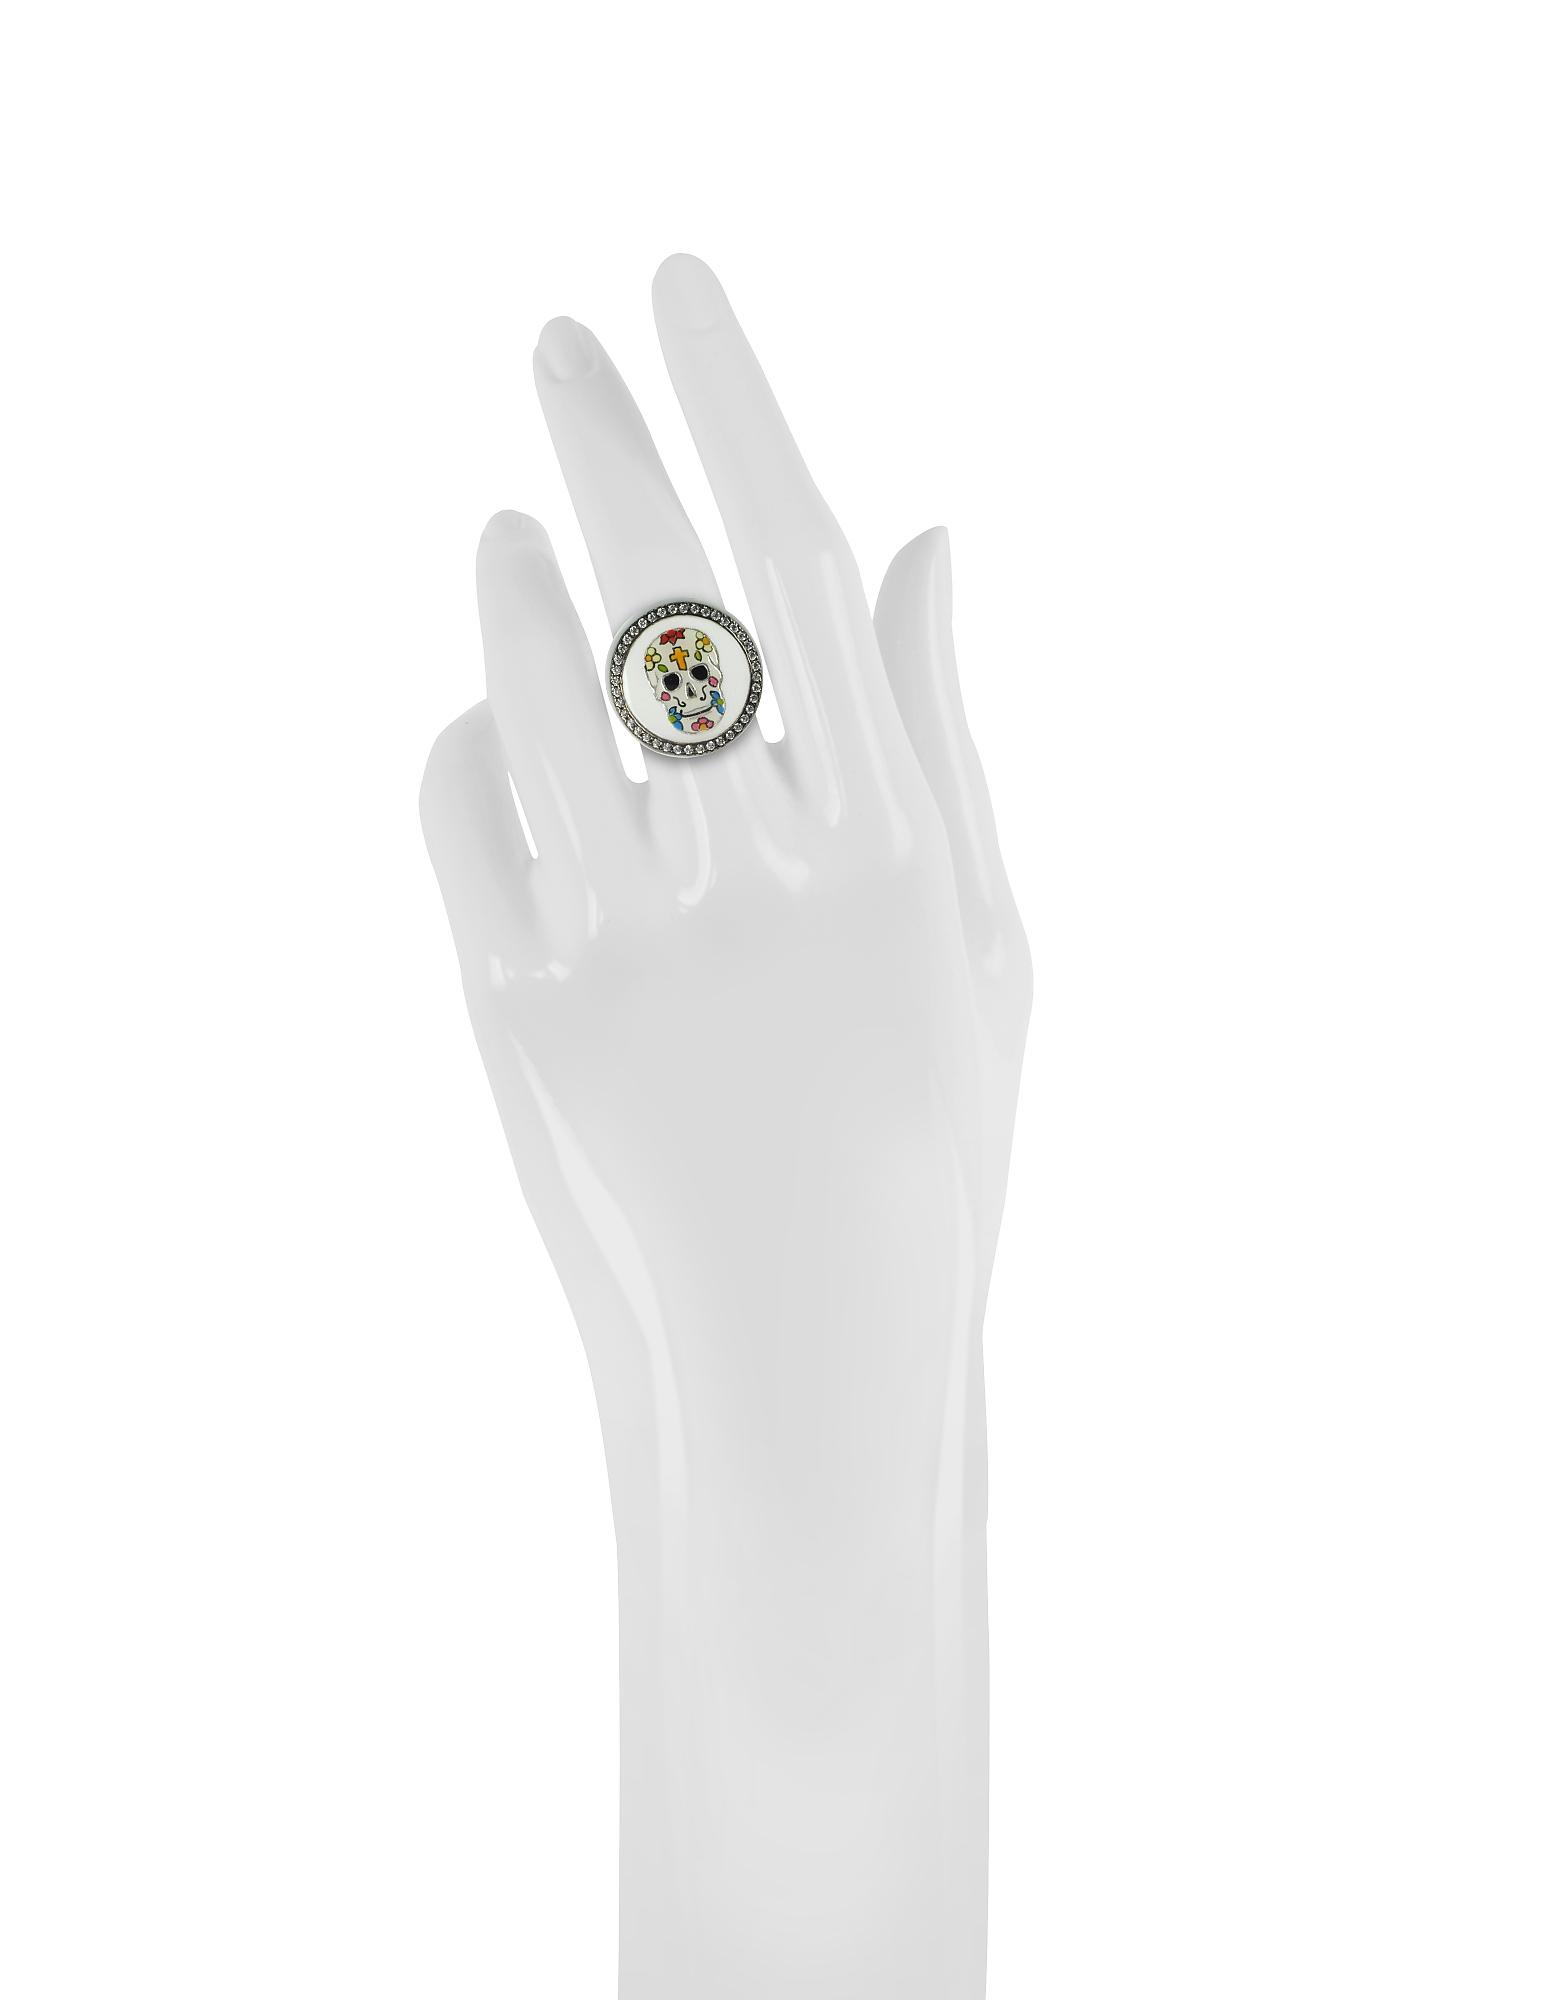 Calavera Skull Rhodium Plated Sterling Silver Adjustable Ring w/White Cubic Zirconia от Forzieri.com INT